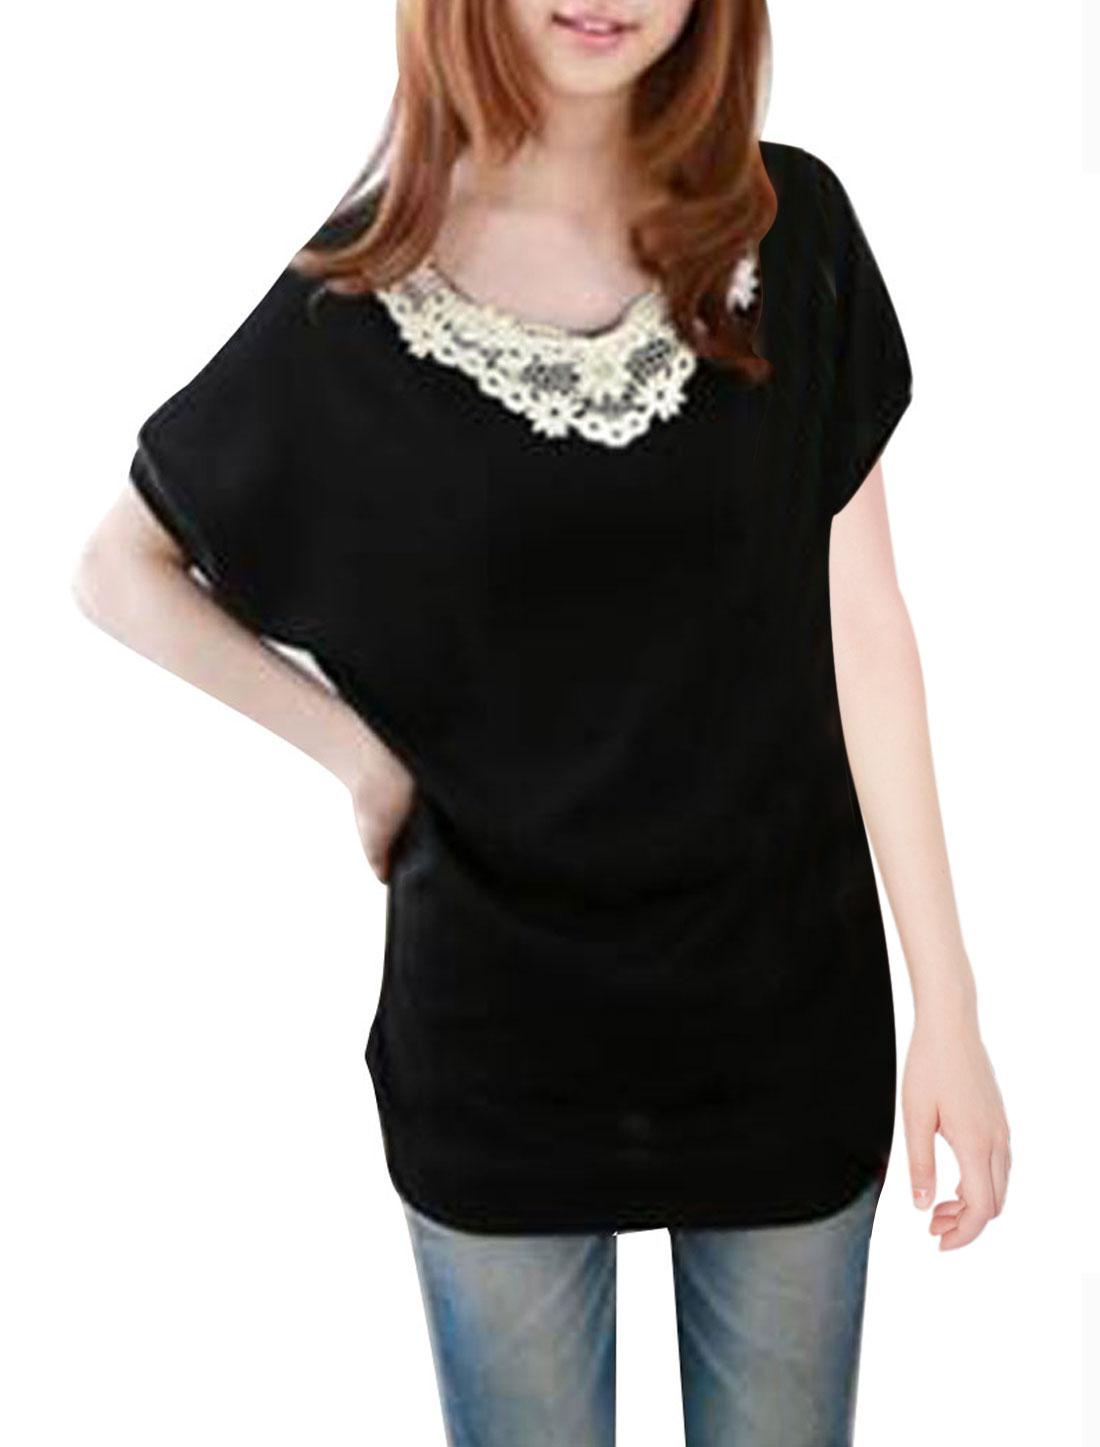 Women Embellished Crochet Stretchy Leisure Shirt Black S